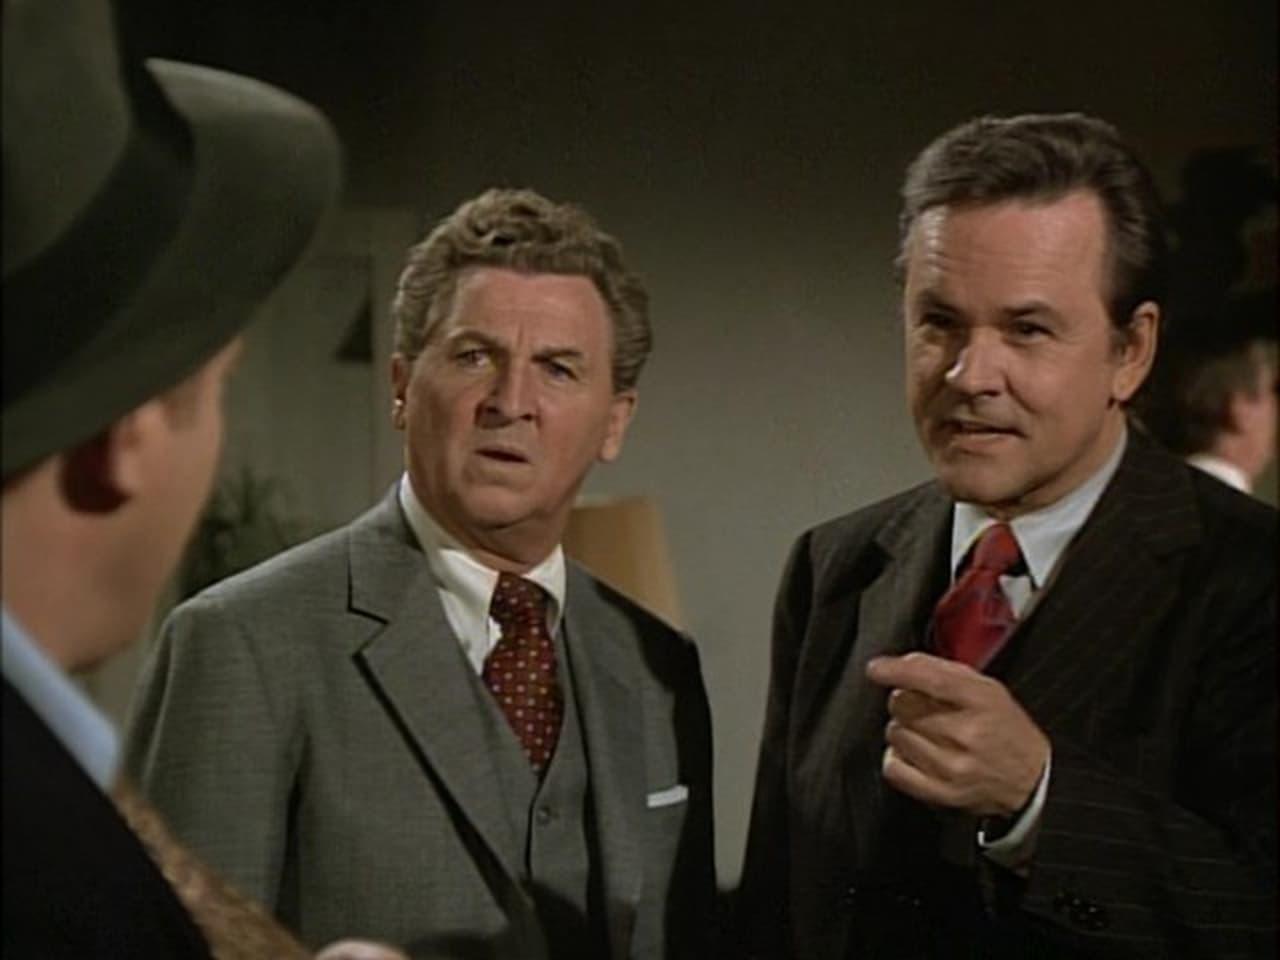 Ellery Queen Episode: The Adventure of the Hard Hearted Huckster